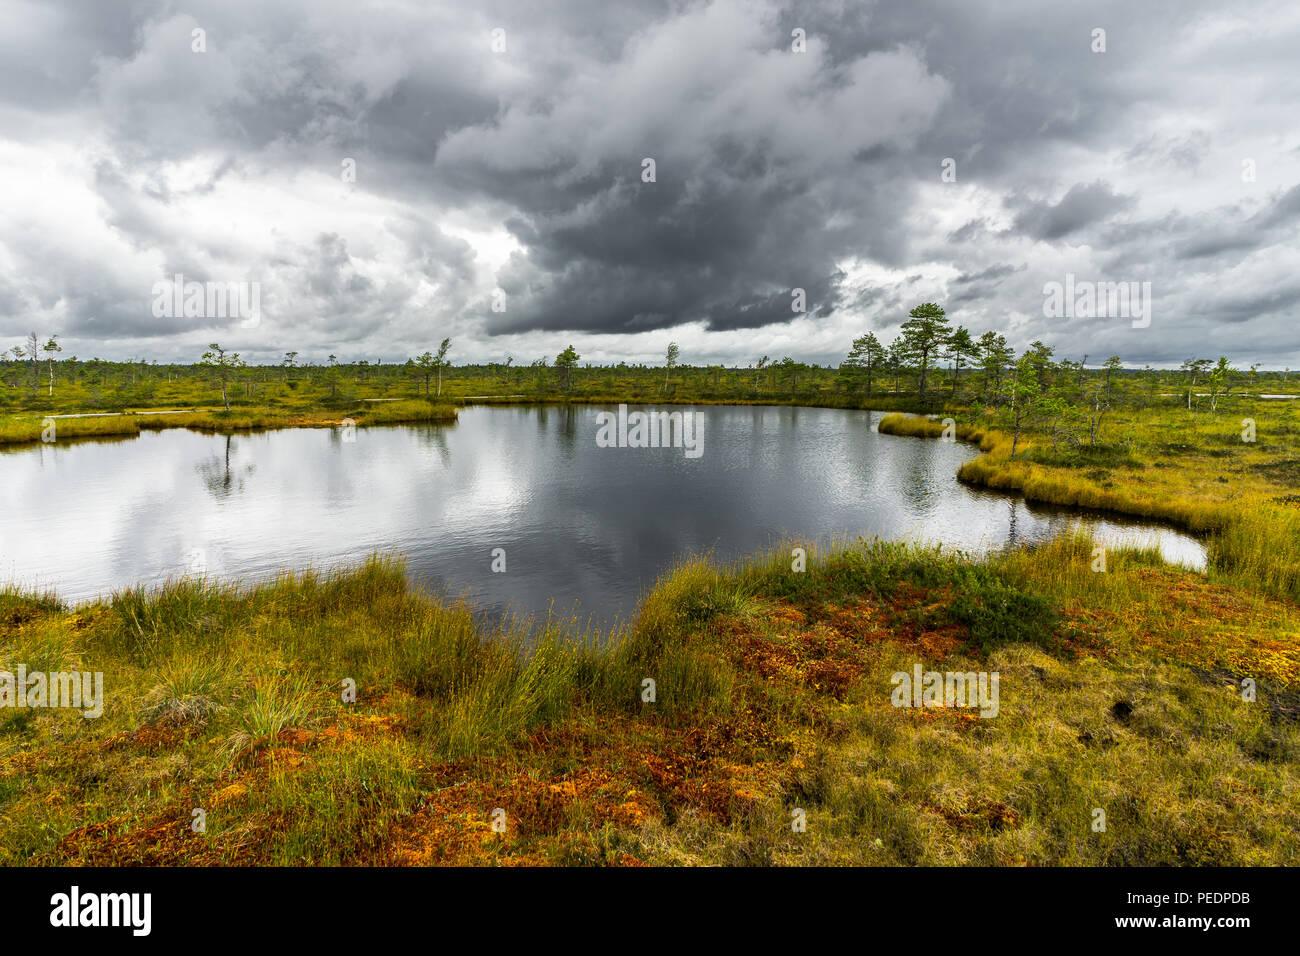 Misty Landschaft mit Viru Raba Moor im Moor. Lahemaa Nationalpark in Estland. Foto in Estland. Stockbild